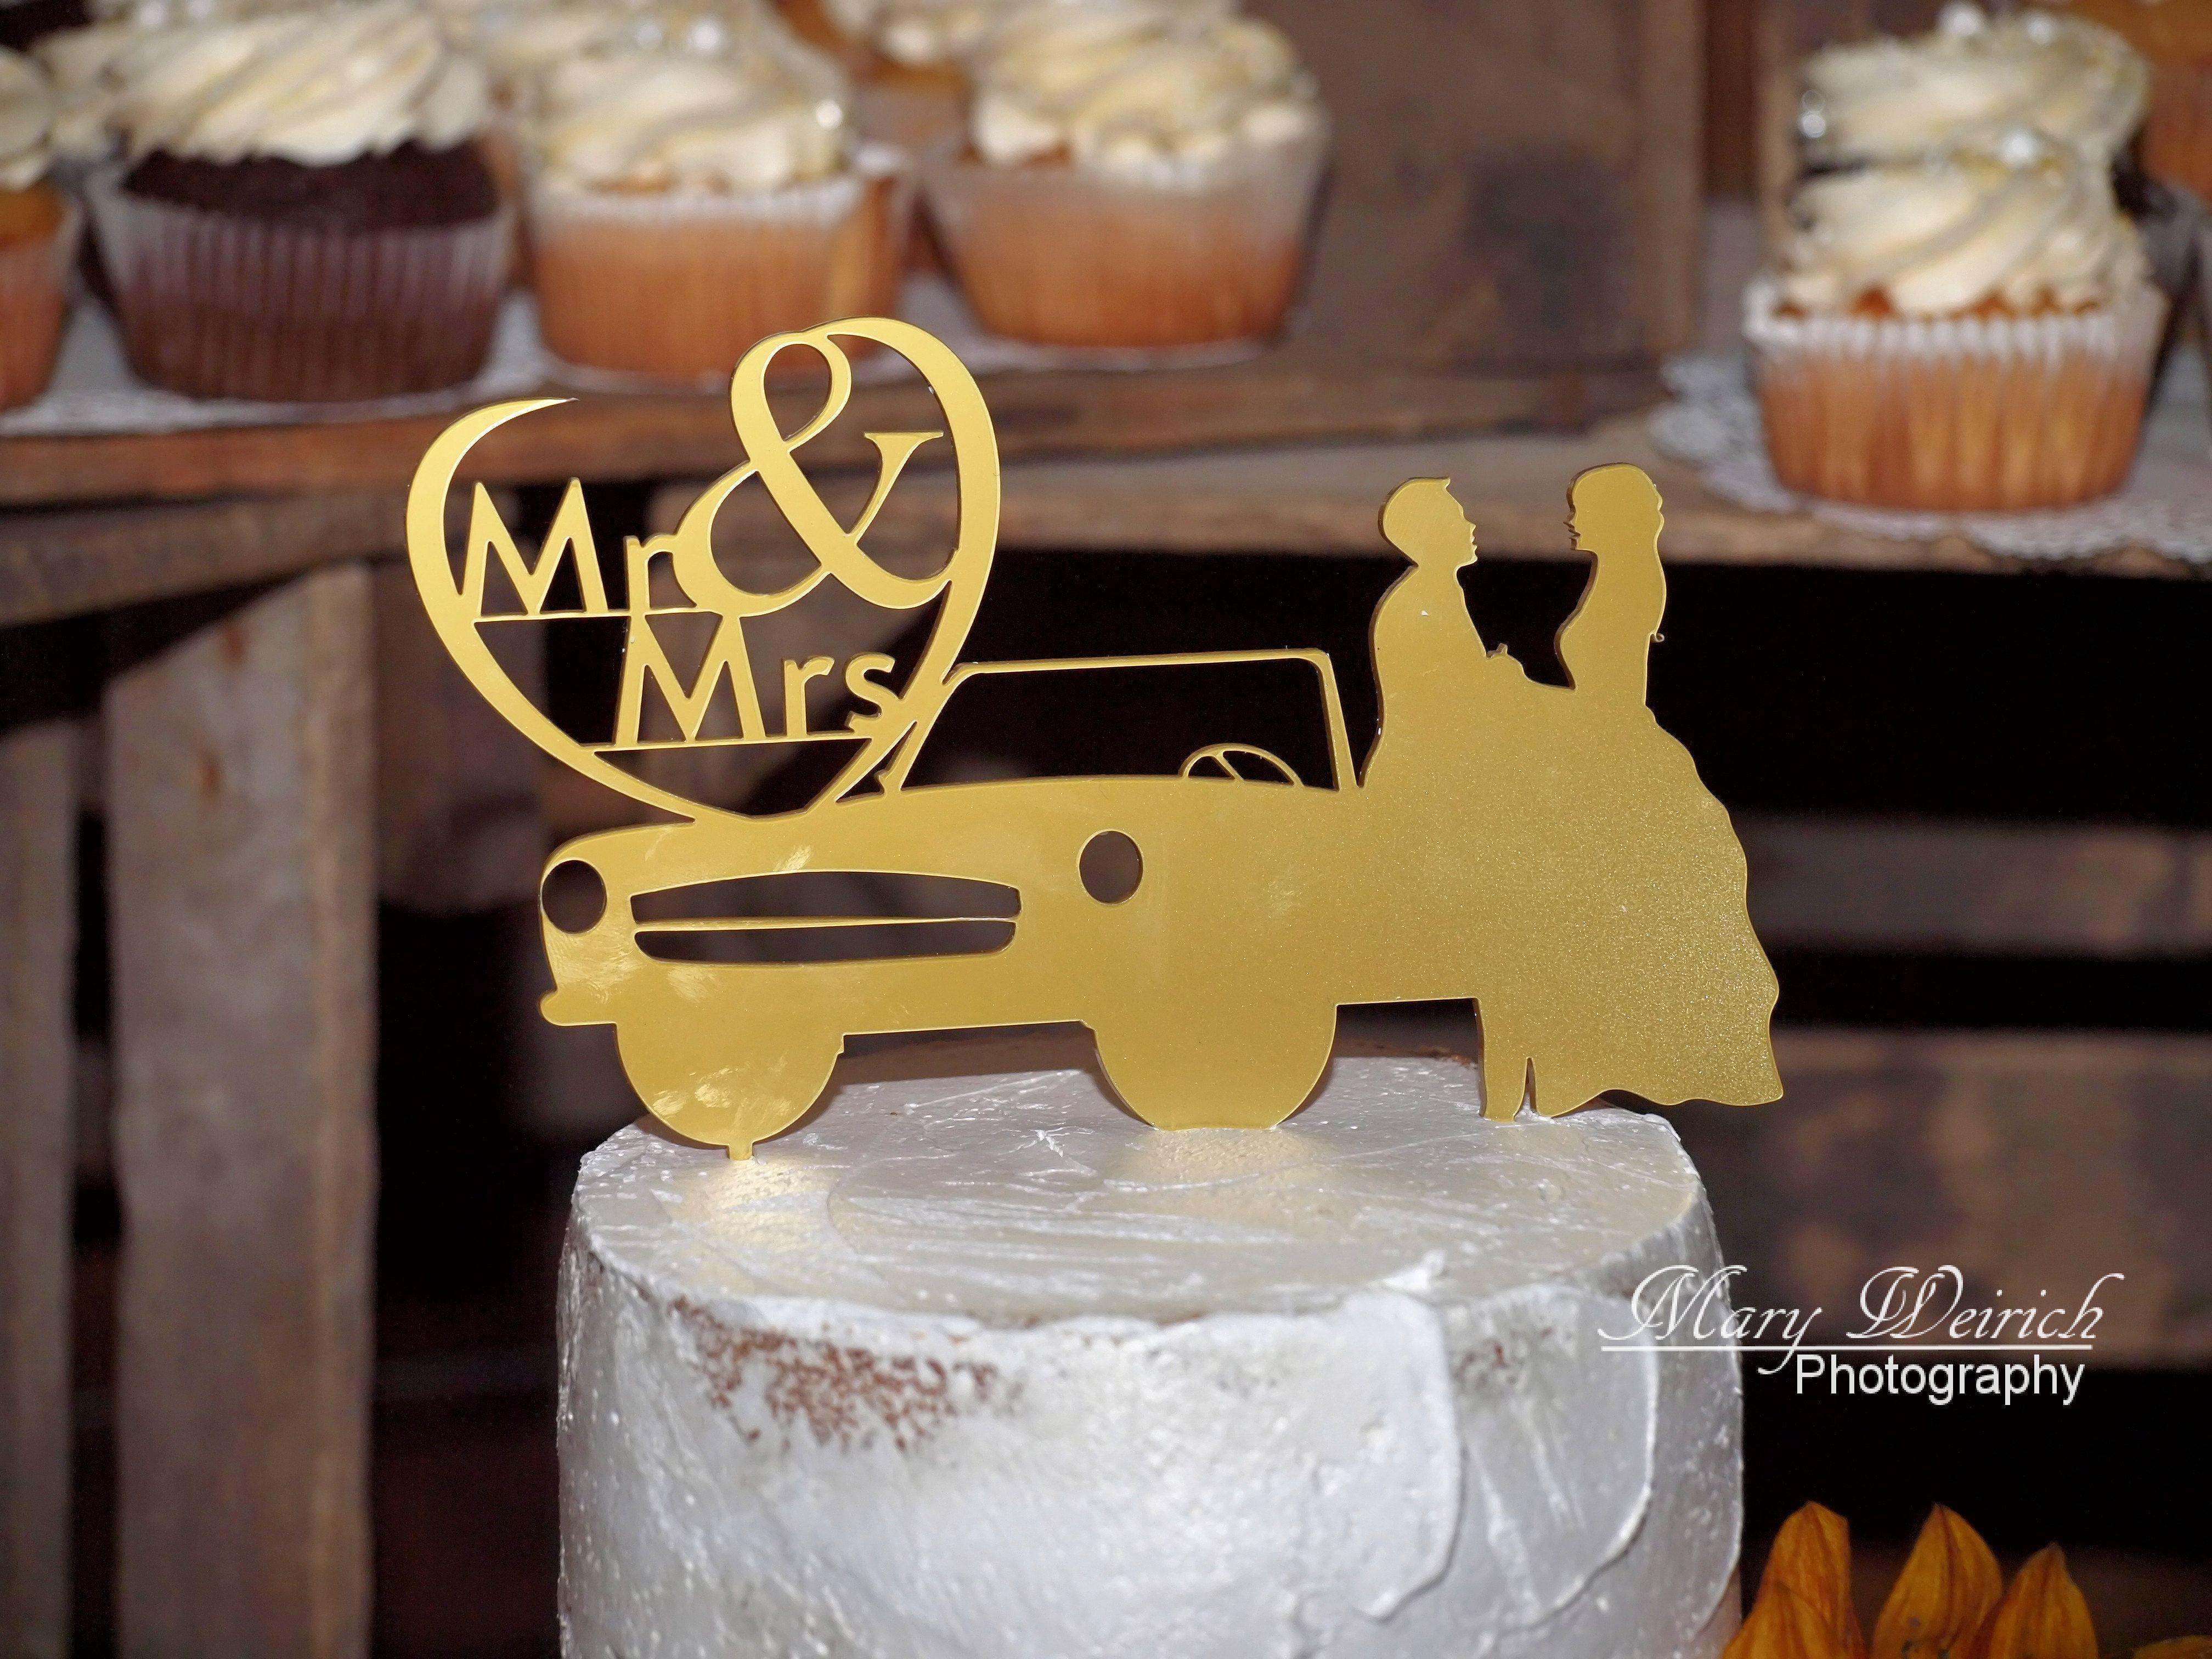 Ford Mustang Vintage Car Wedding Cake Topper Bride Groom Cake Top Wedding Cake Wedding Cake Topper Car Vintage Car Wedding Wedding Cake Toppers